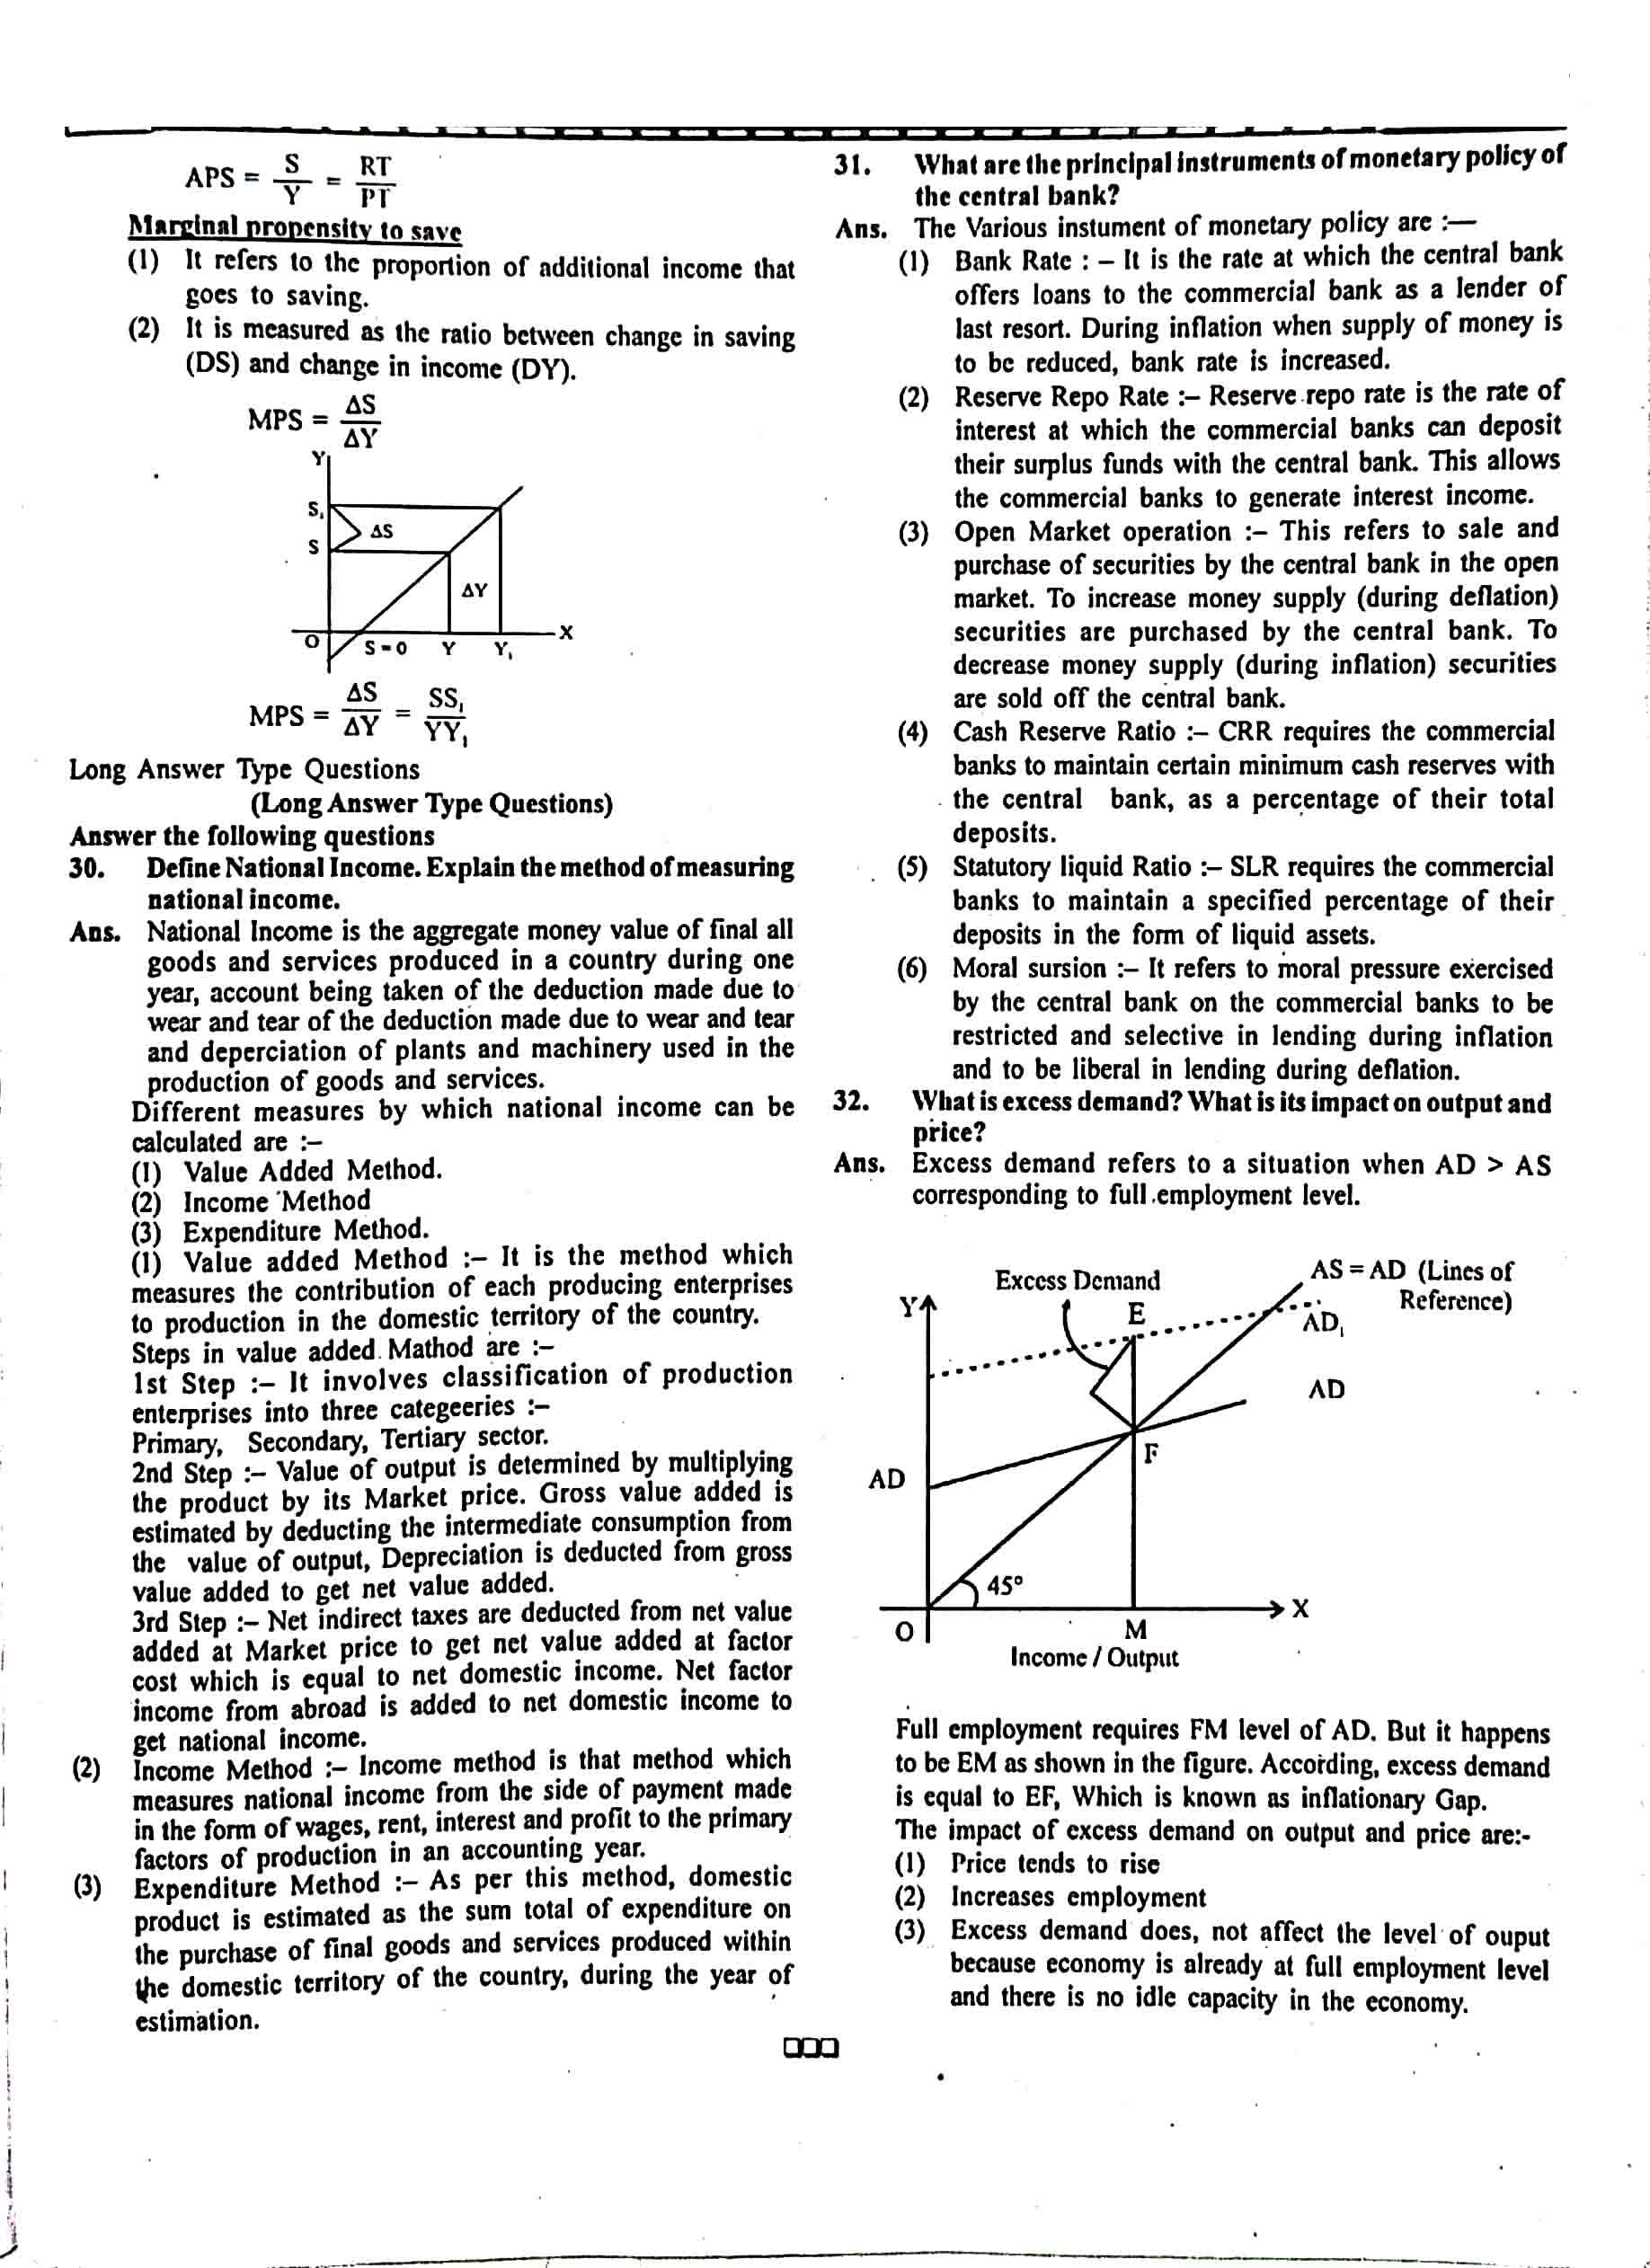 JAC Class 12 economics 2014 Question Paper 04